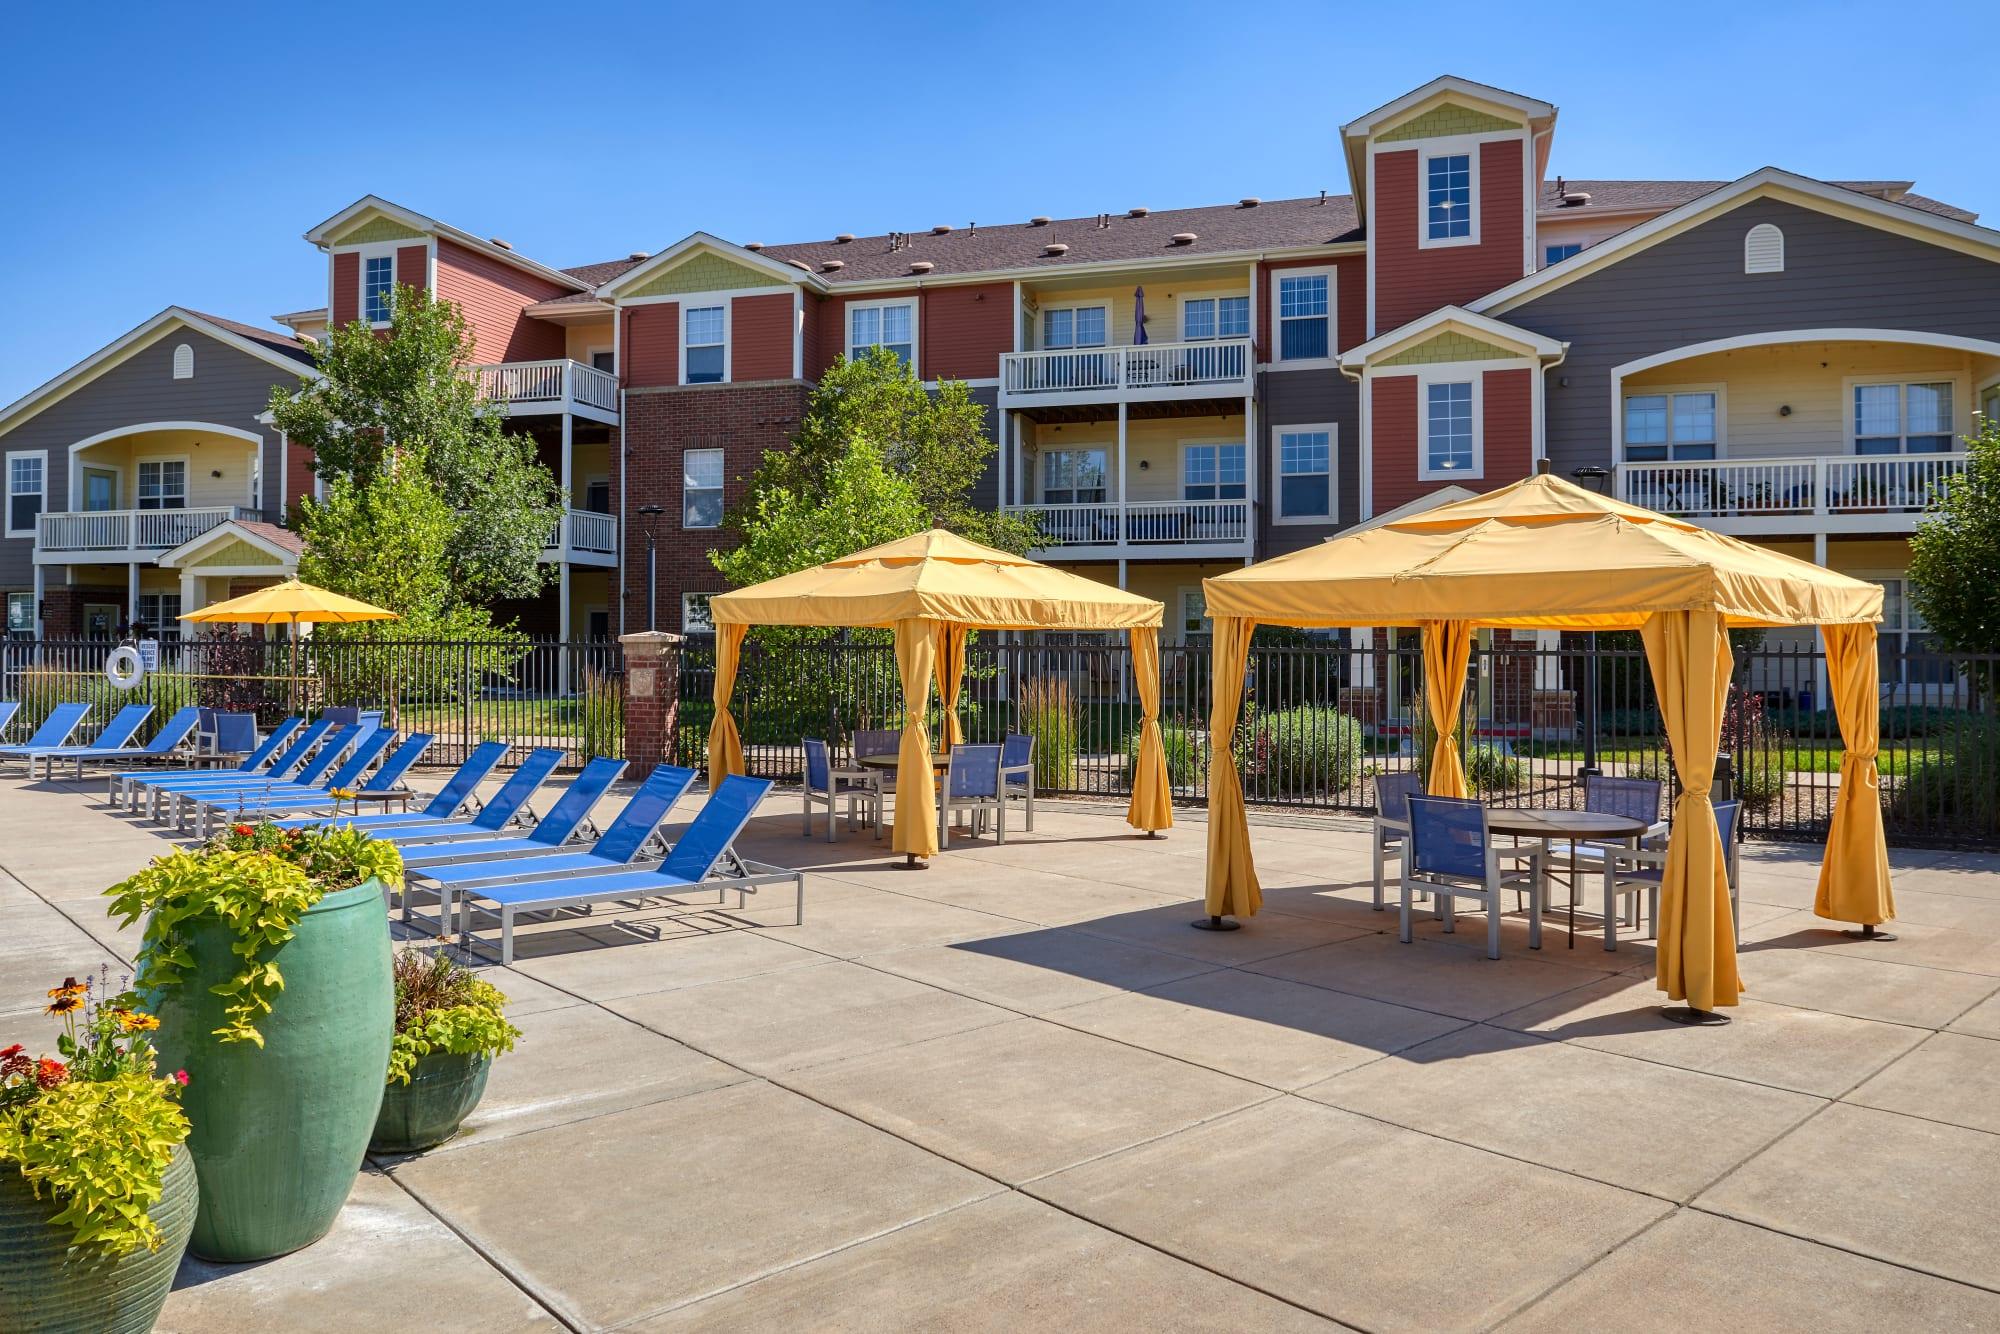 Poolside cabanas at Bear Valley Park in Denver, Colorado